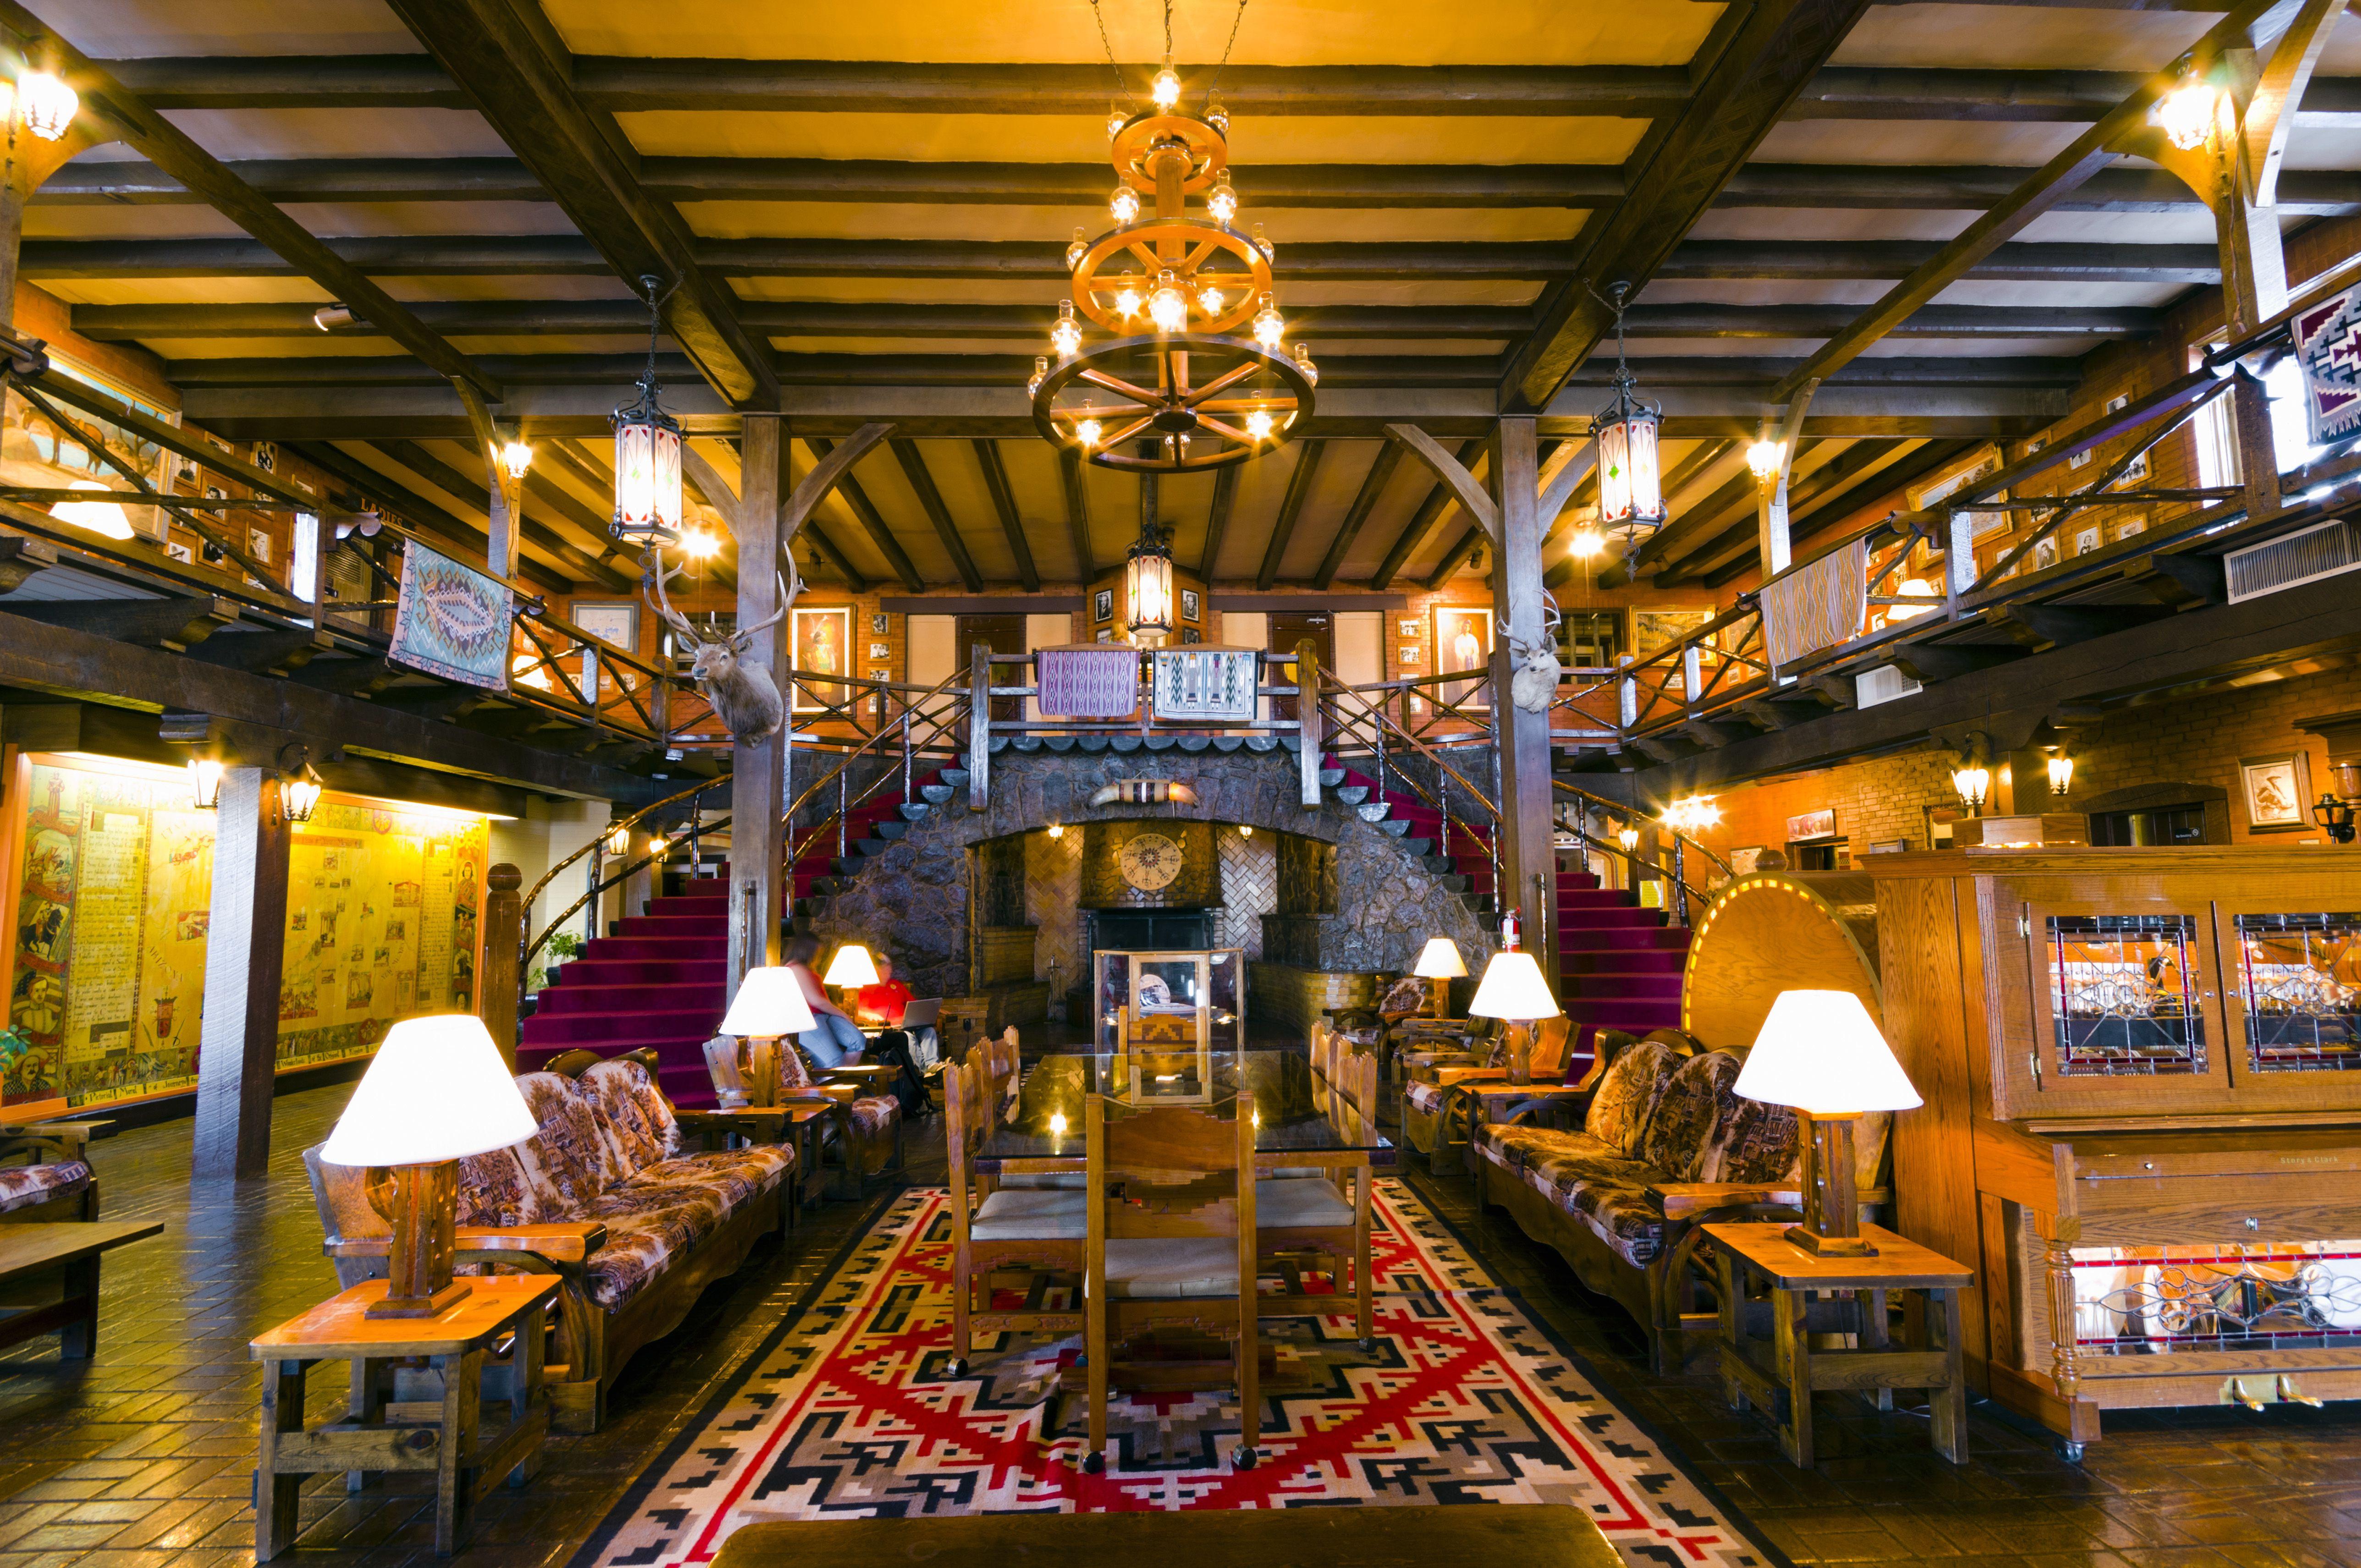 Visiting The Historic El Rancho Hotel